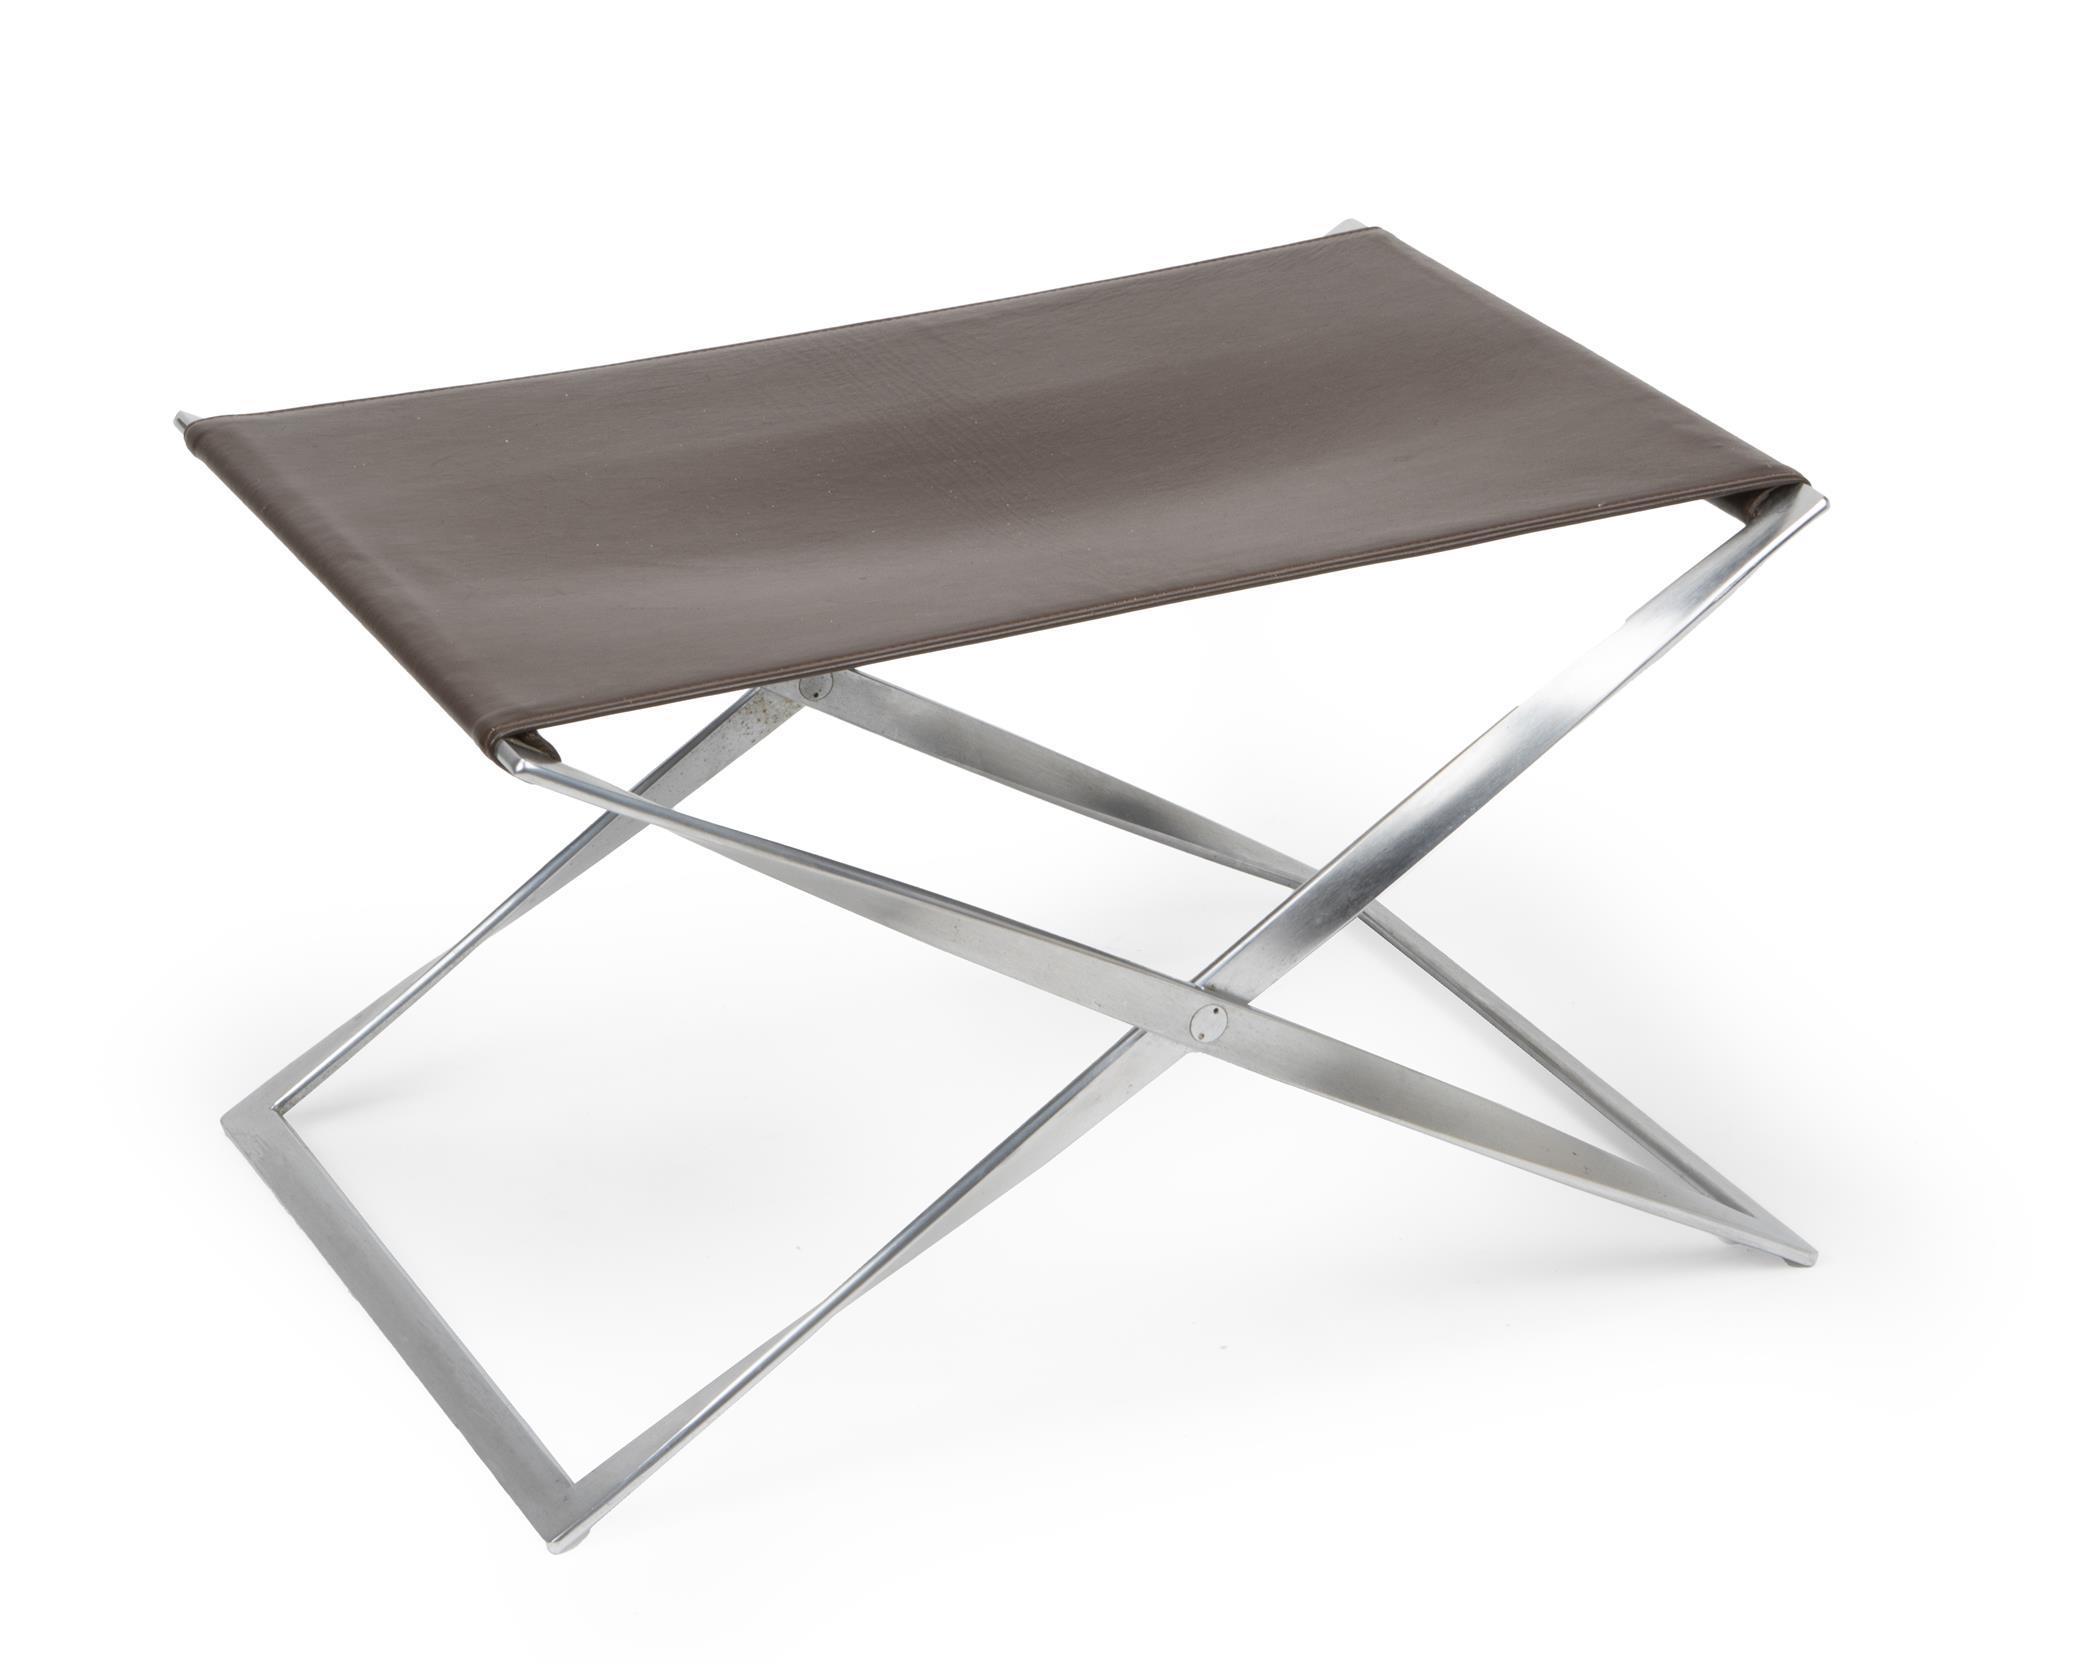 "Poul Kjaerholm, (1929-1980, Danish), PK91 folding footstool, Chromed metal and sienna brown leather, 14.325"" H x 23.75"" W x 17.75"" D"